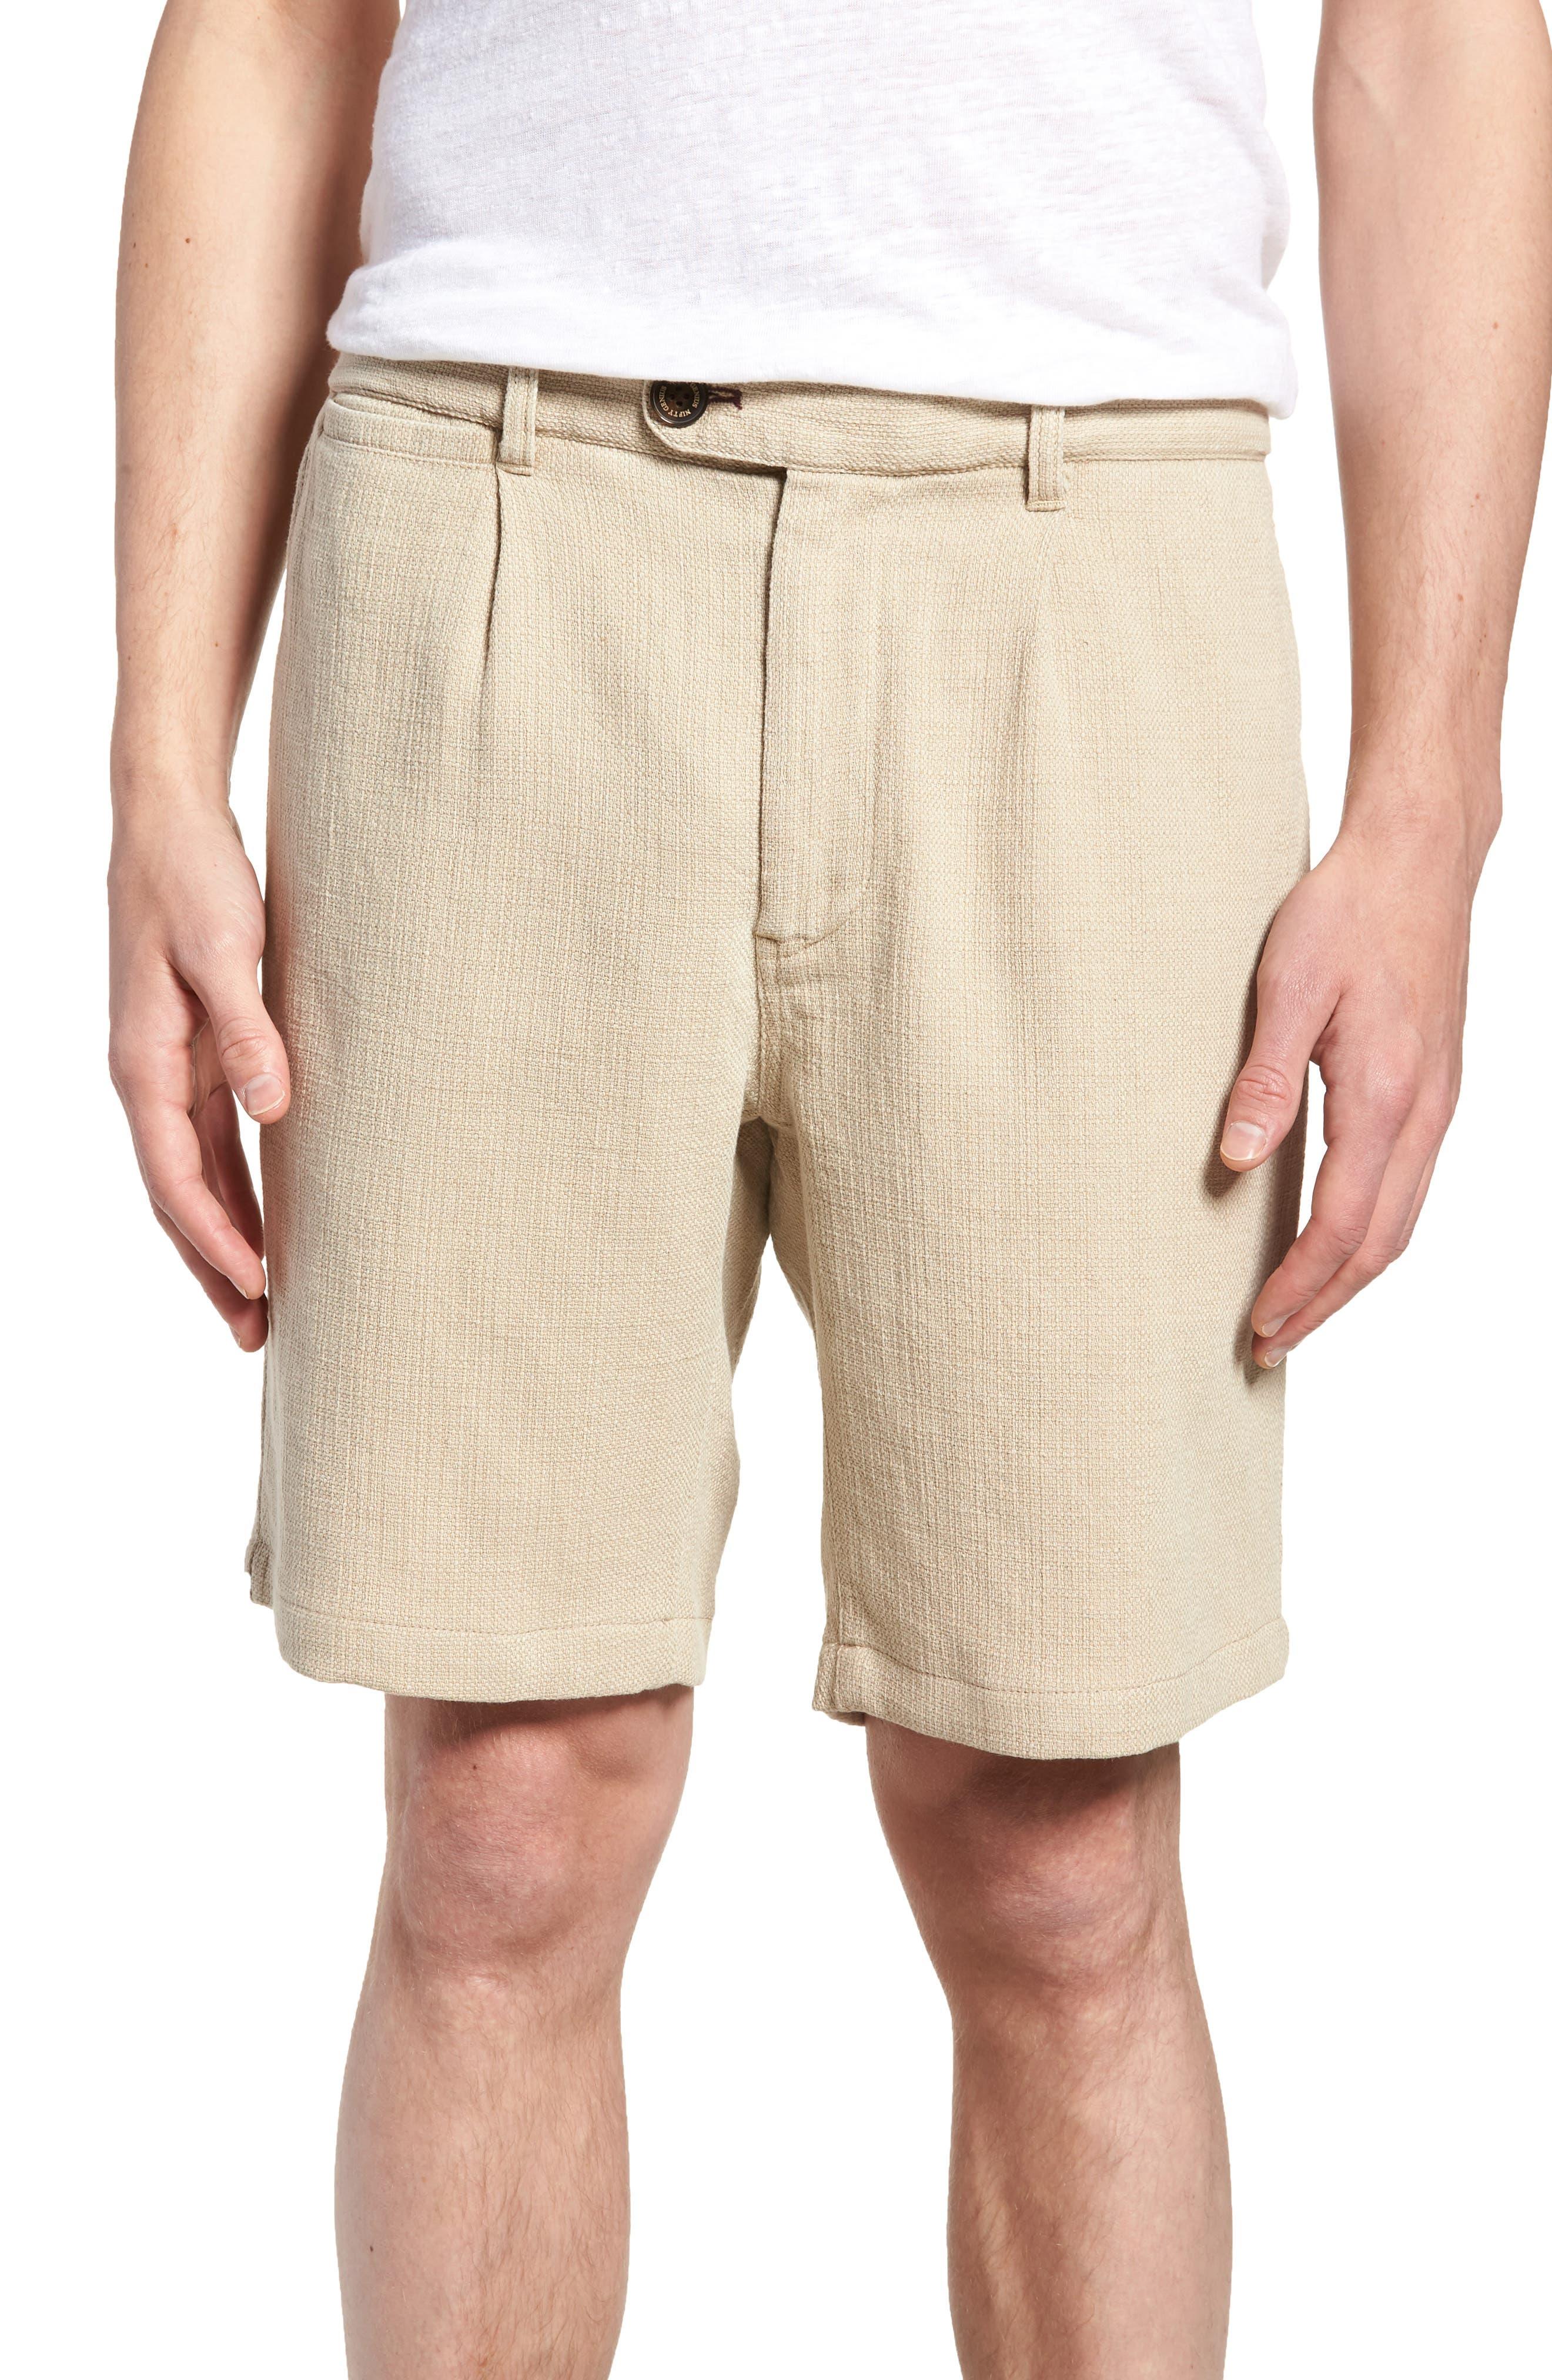 NIFTY GENIUS Thomas Regular Fit Pleated Shorts, Main, color, 250